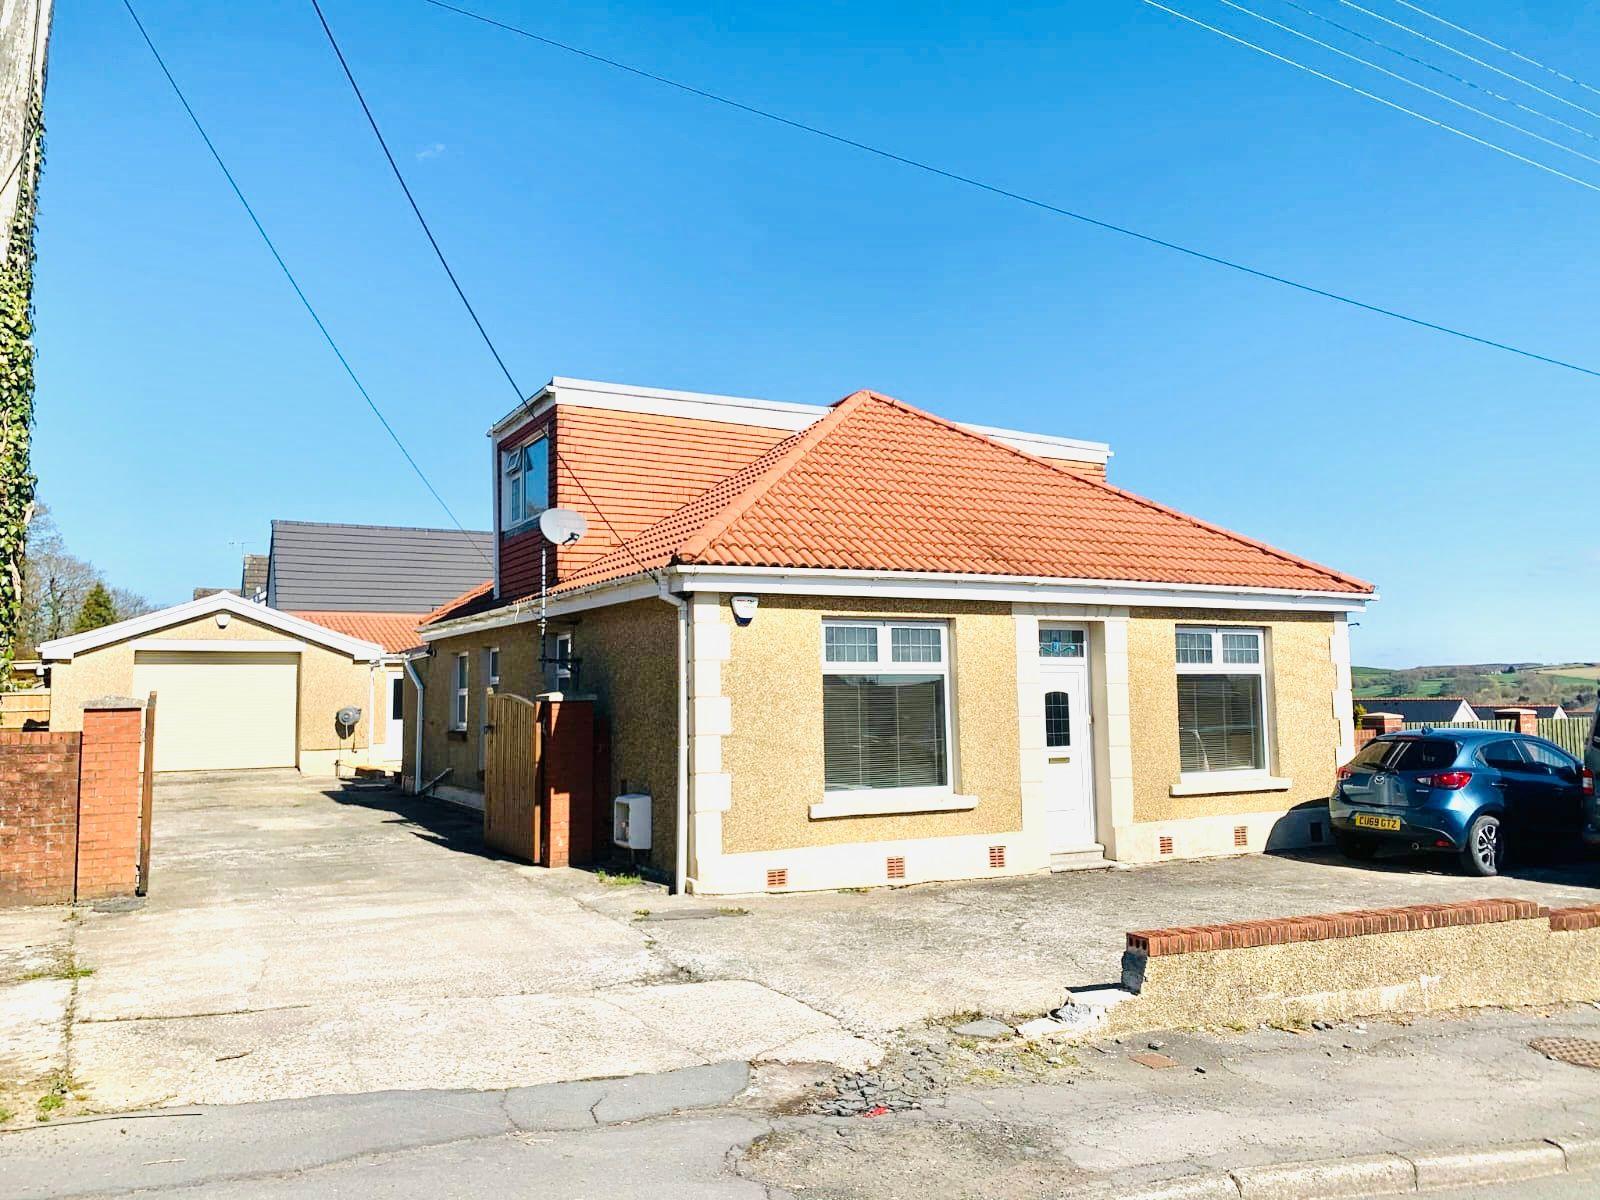 Property photo 1 of 25.